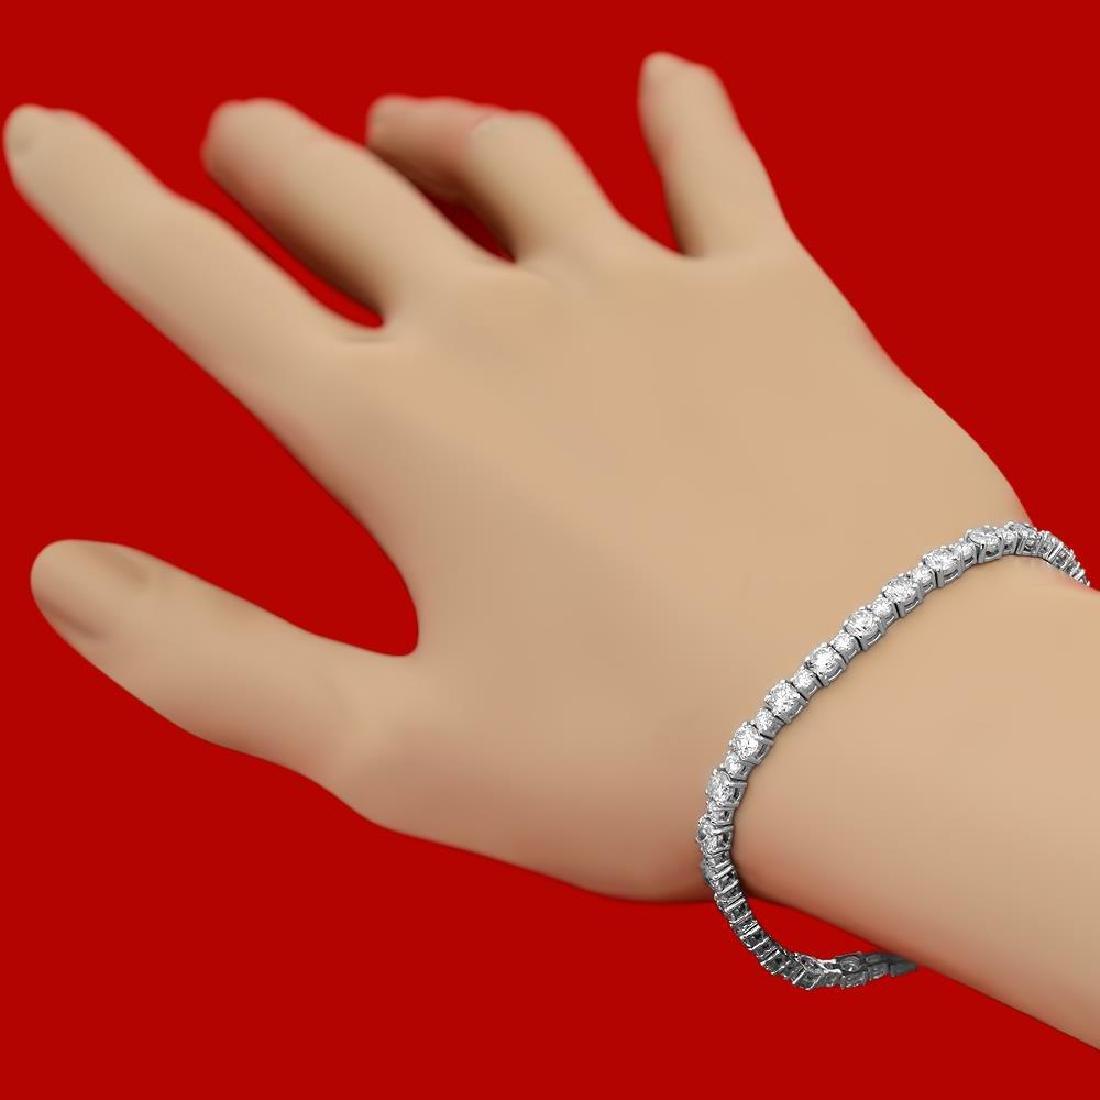 18k Gold 7.50ct Diamond Bracelet - 2